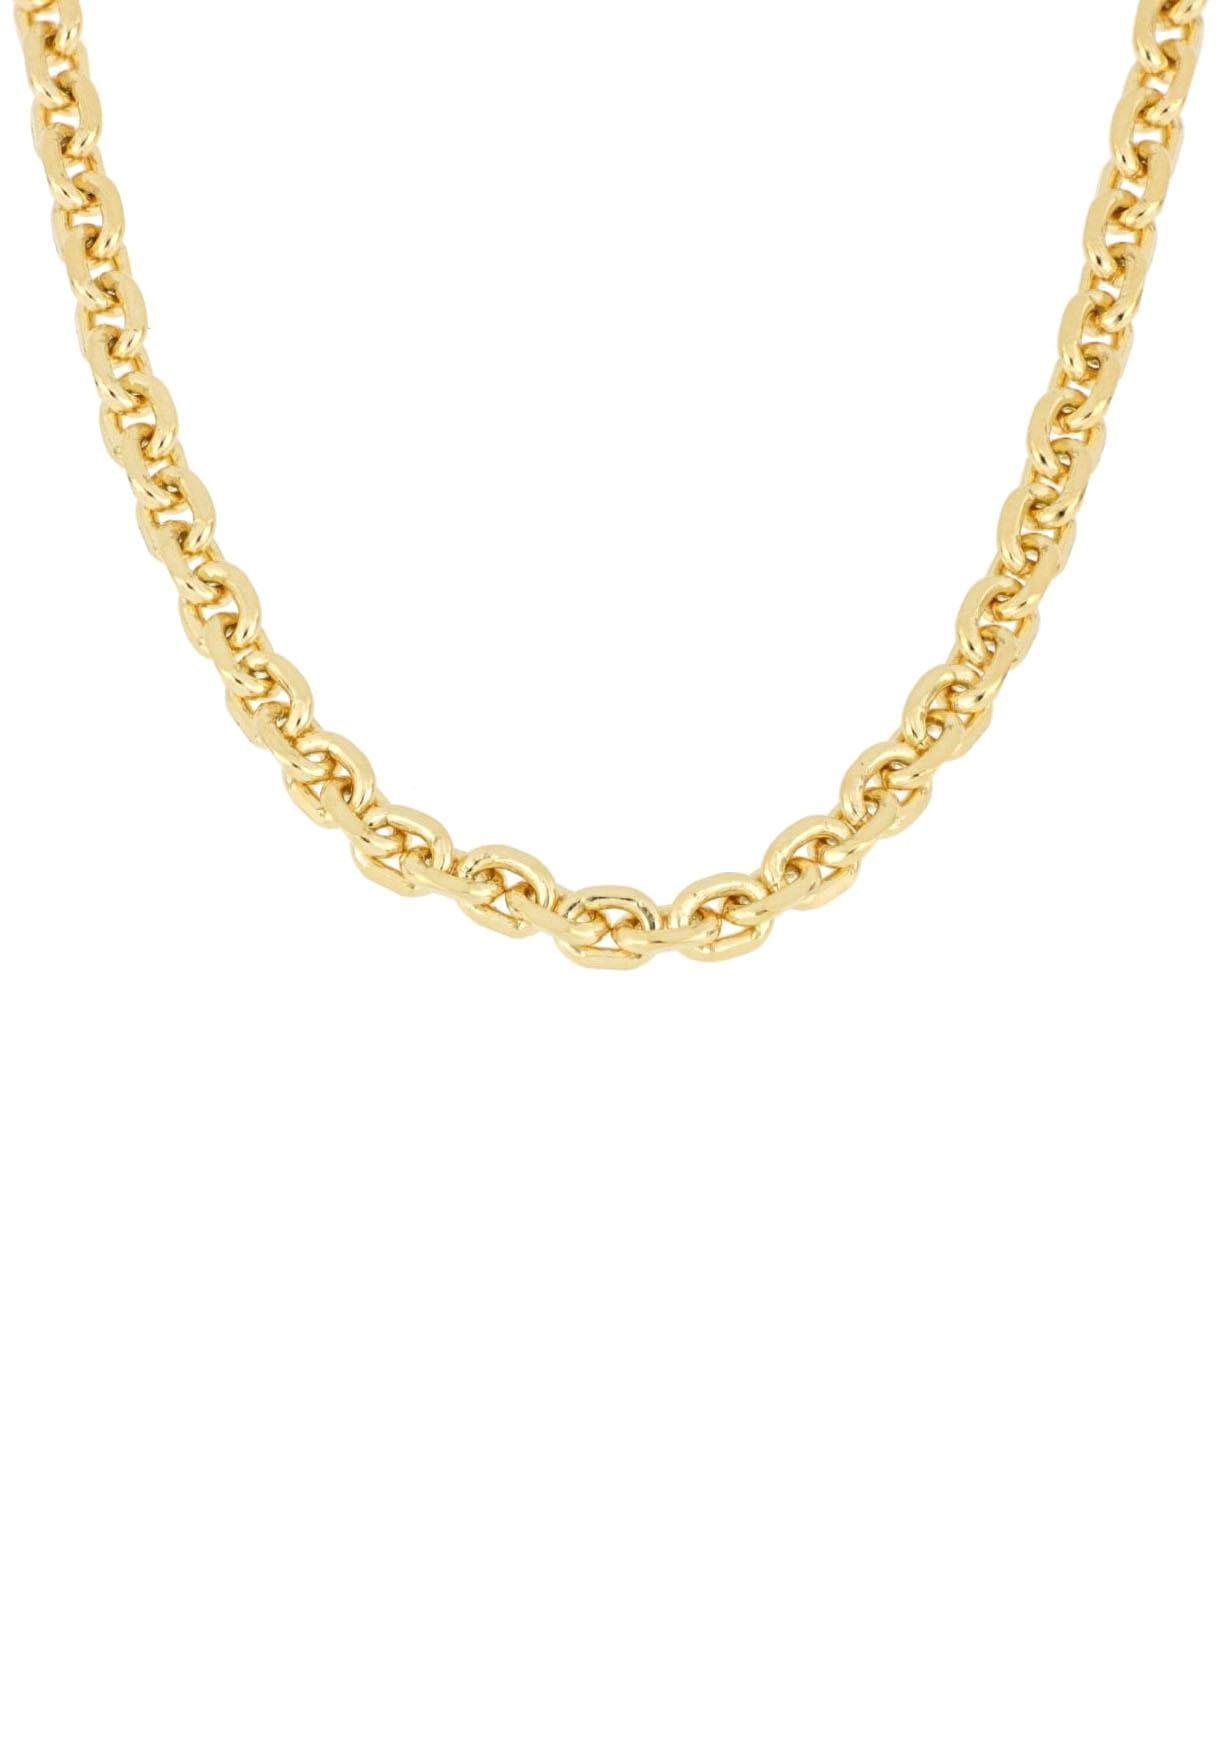 Firetti Gliederkette Ankerkettengliederung 4-fach diamantiert | Schmuck > Halsketten | Goldfarben | Firetti